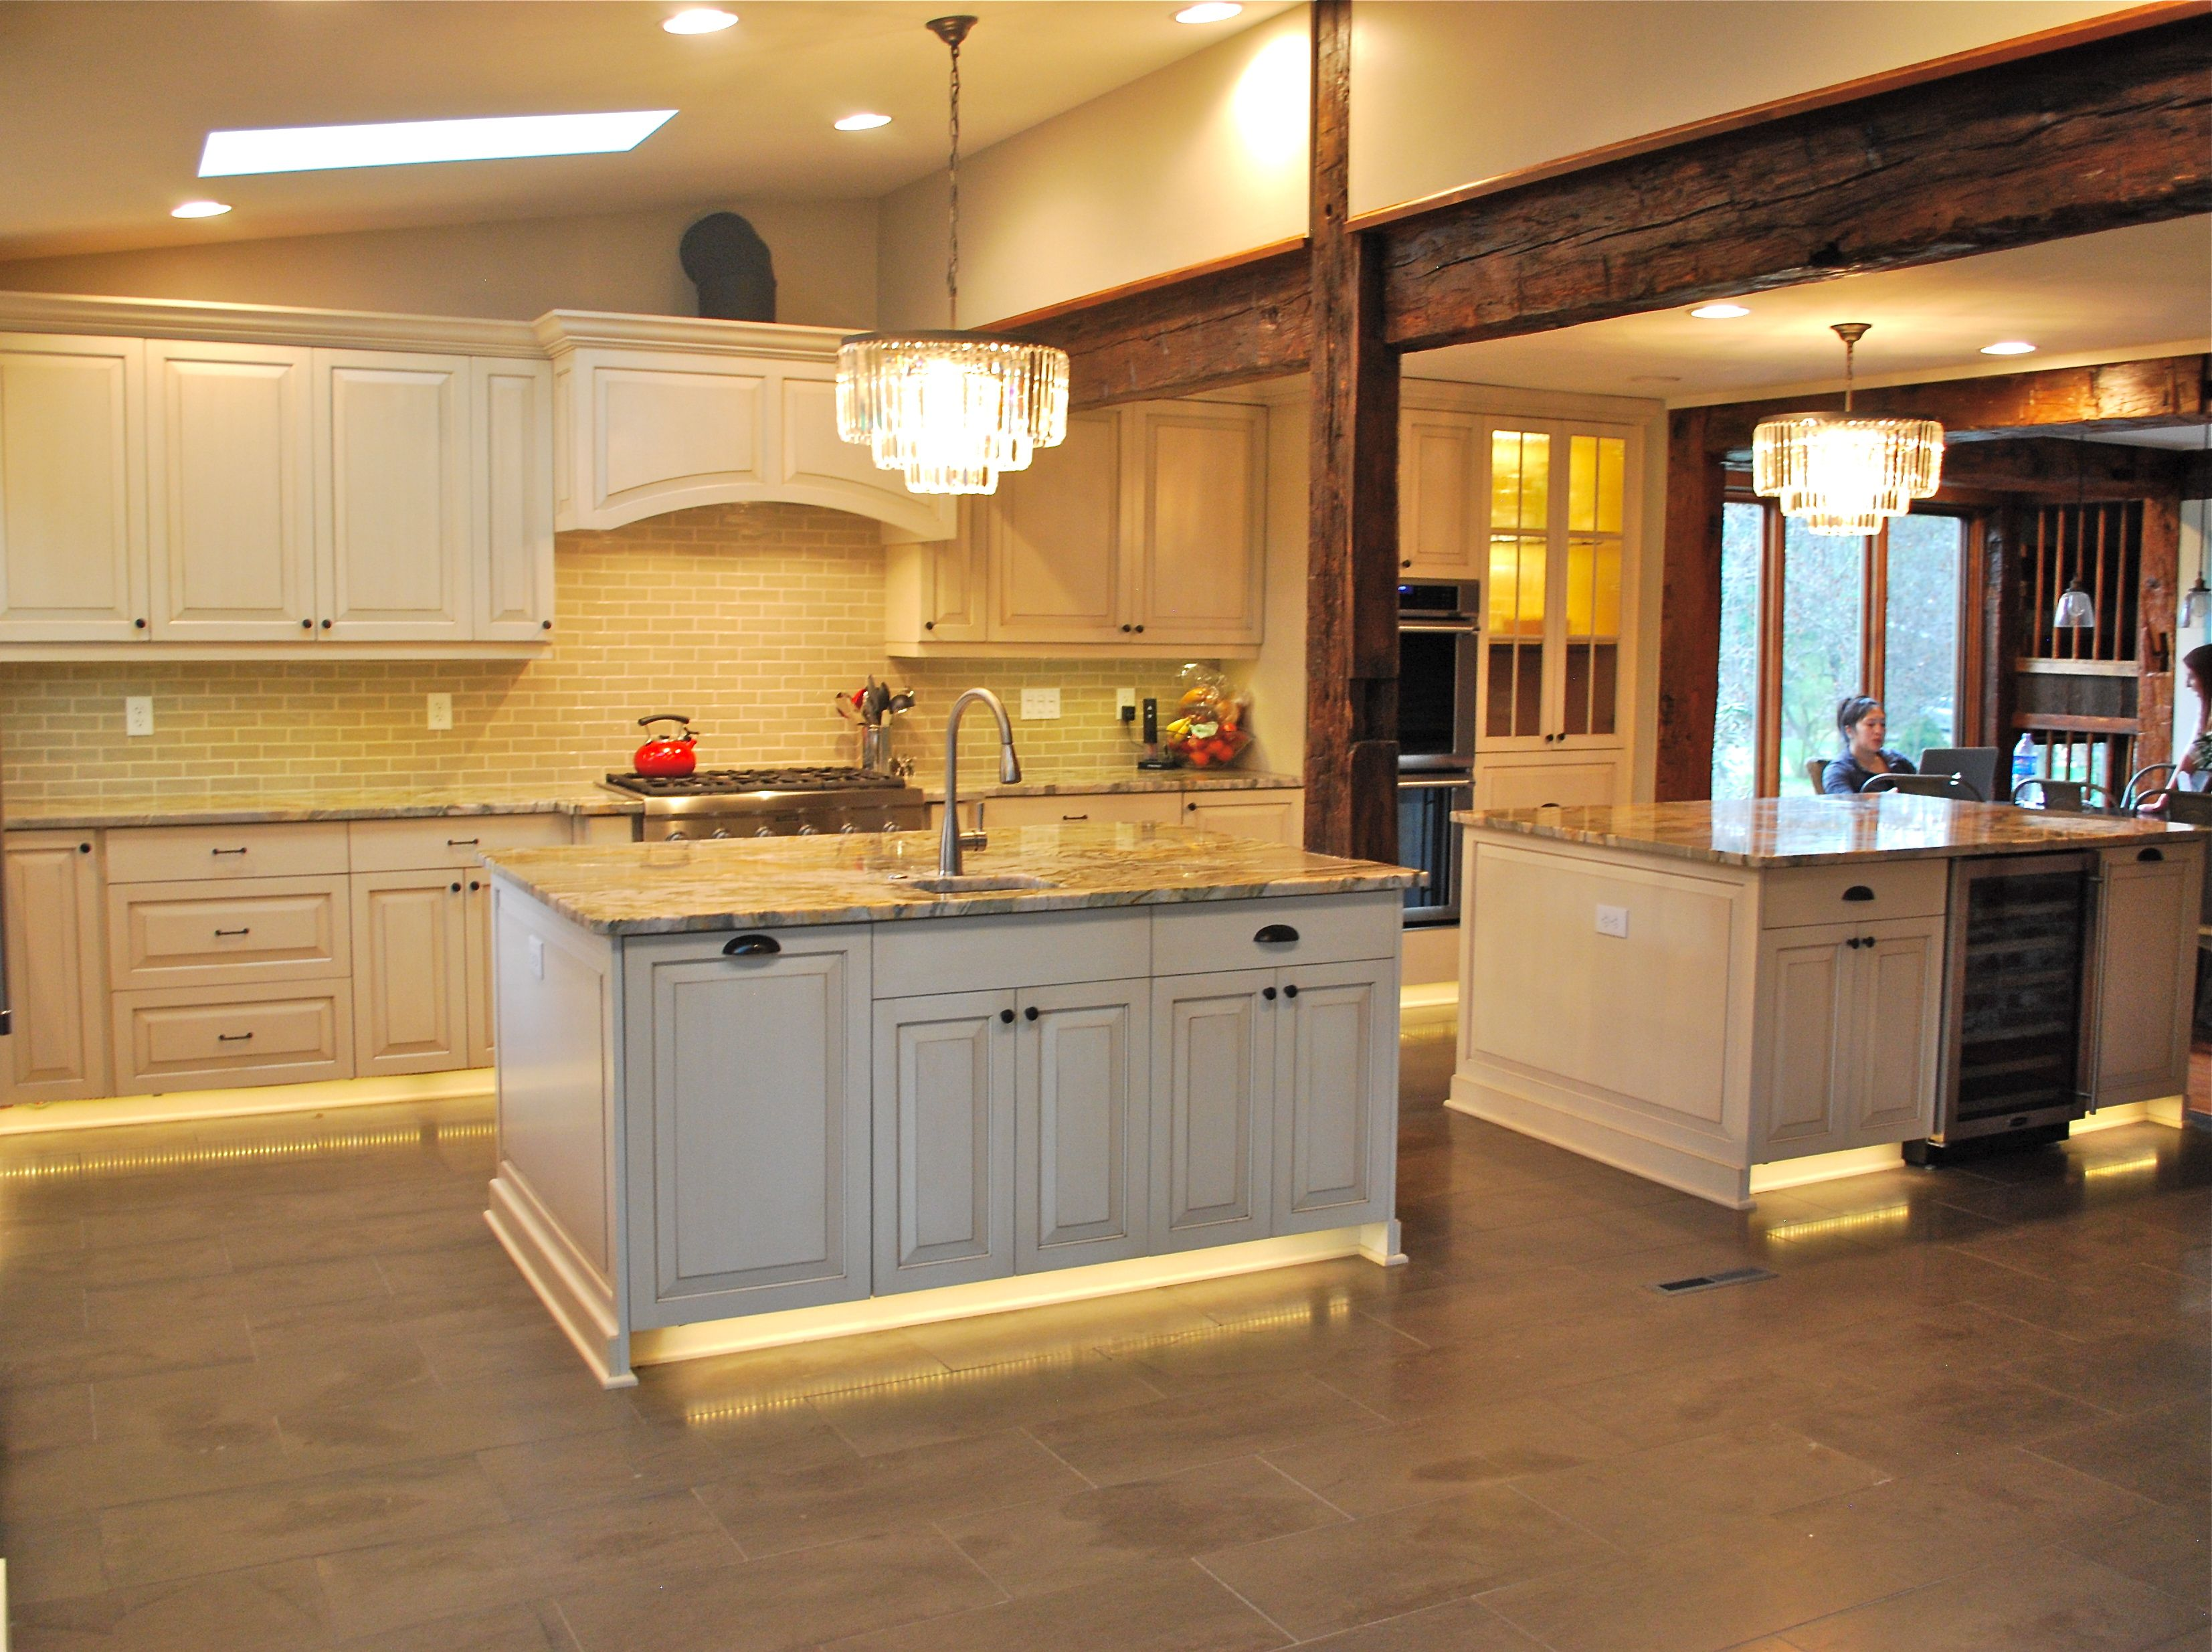 kitchen renovation toe kick led lighting viking kitchen. Black Bedroom Furniture Sets. Home Design Ideas